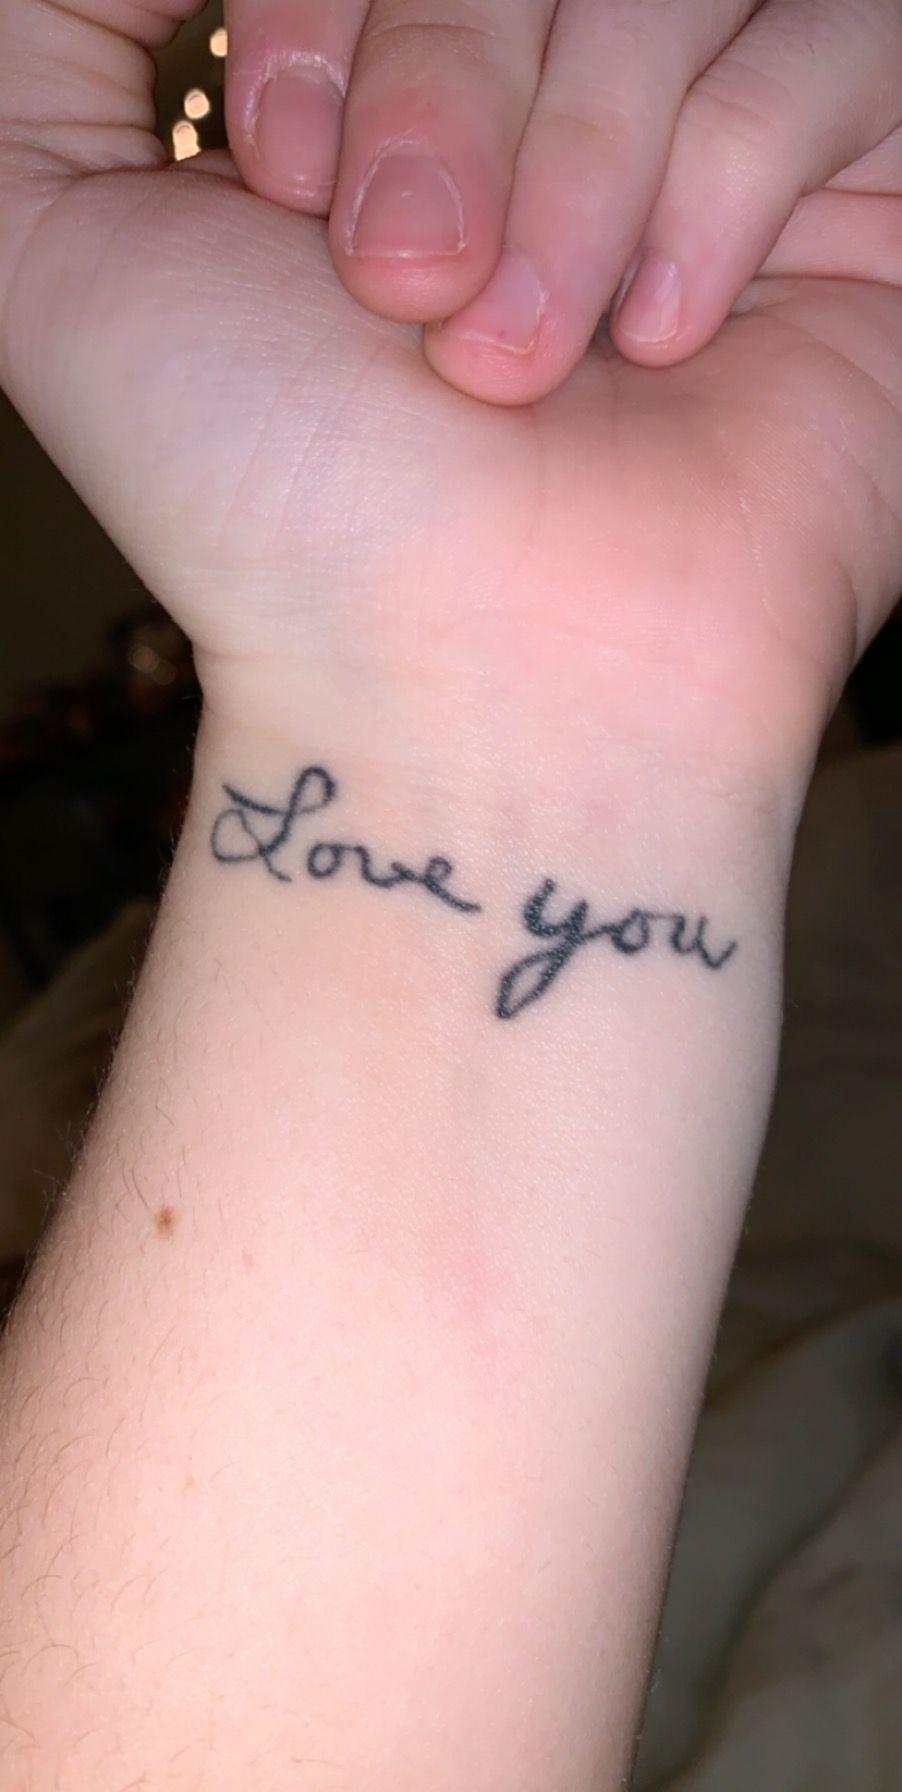 Grandparents handwriting tattoo memorial tattoo (With